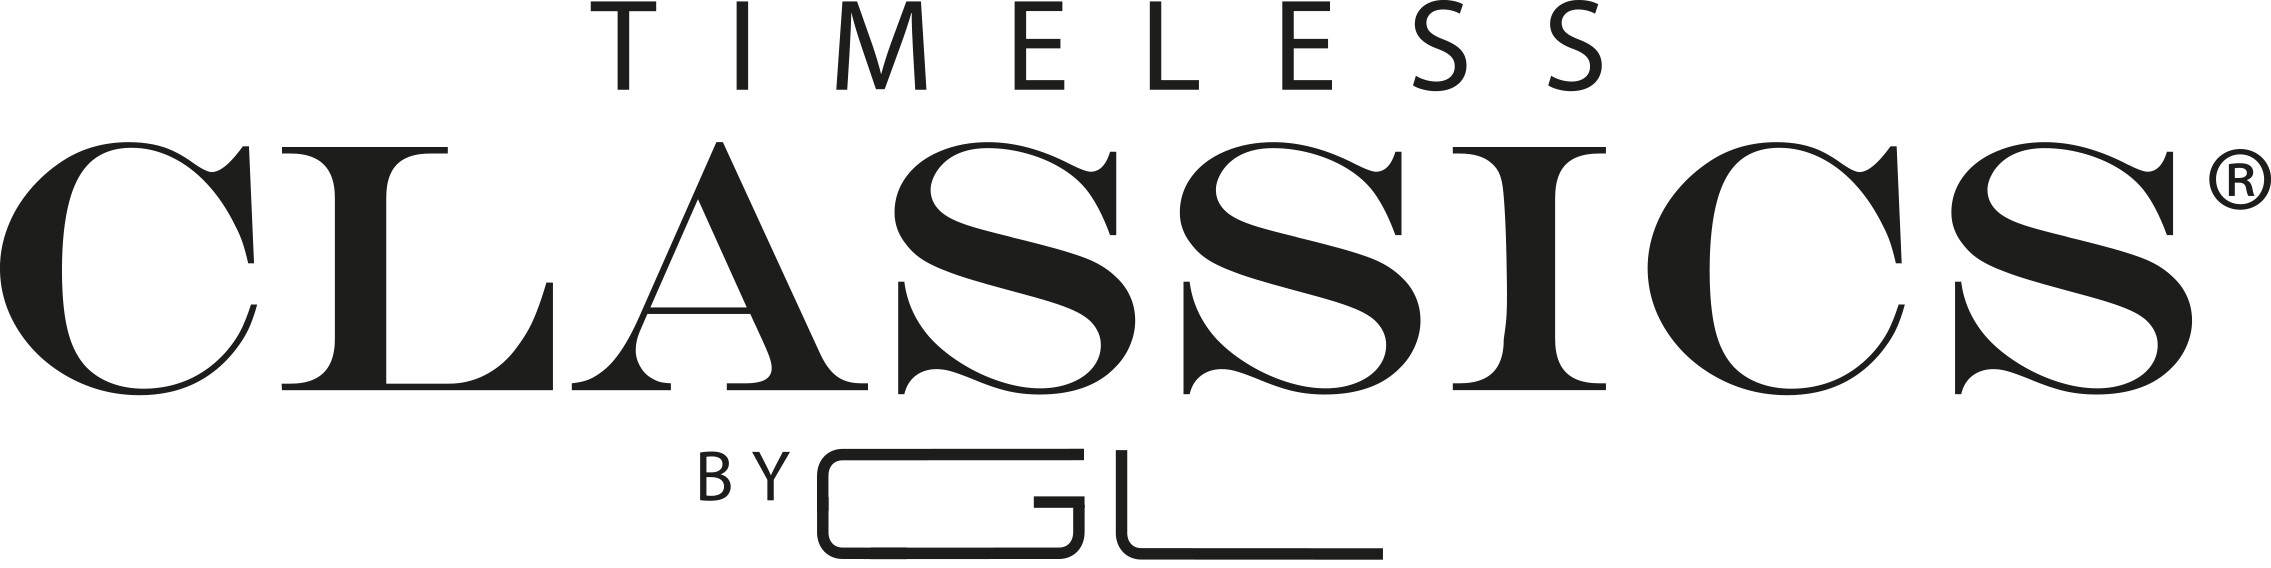 Timeless-Classic-GL.jpg